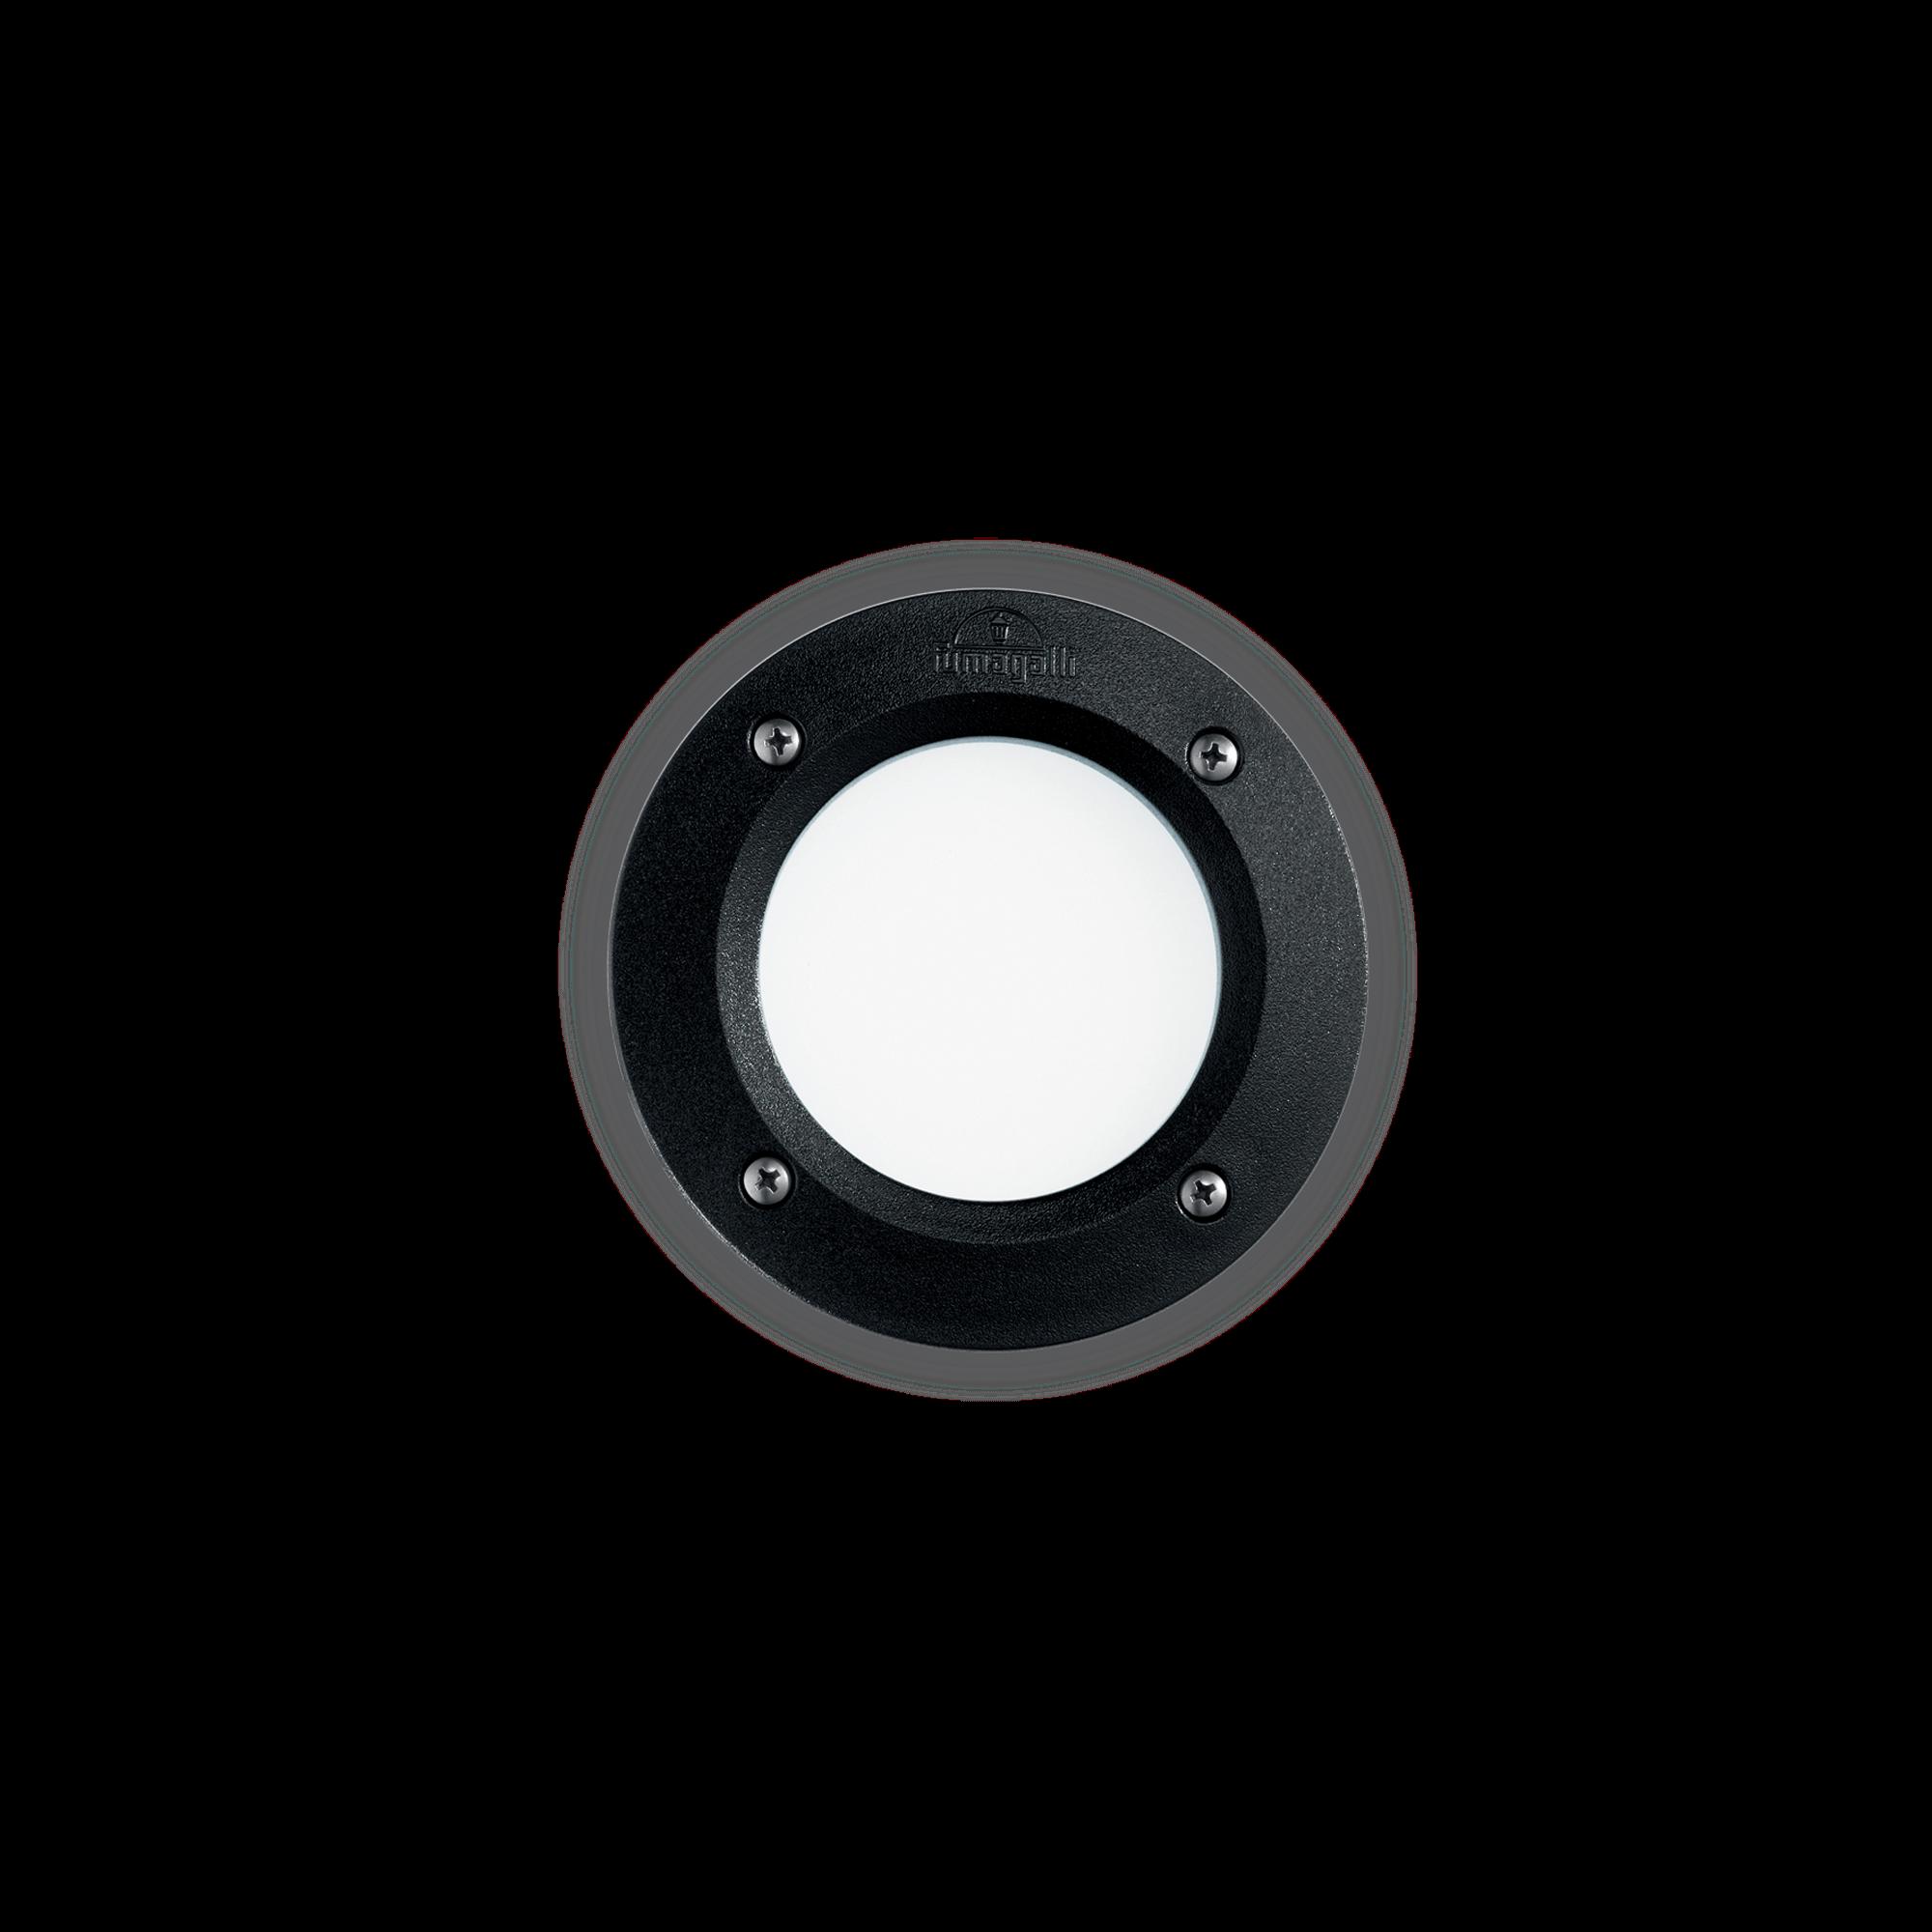 Exteriérové zápustné svítidlo Ideal lux 096551 LETI PT1 ROUND NERO 1xGX53 23W 4000K IP66